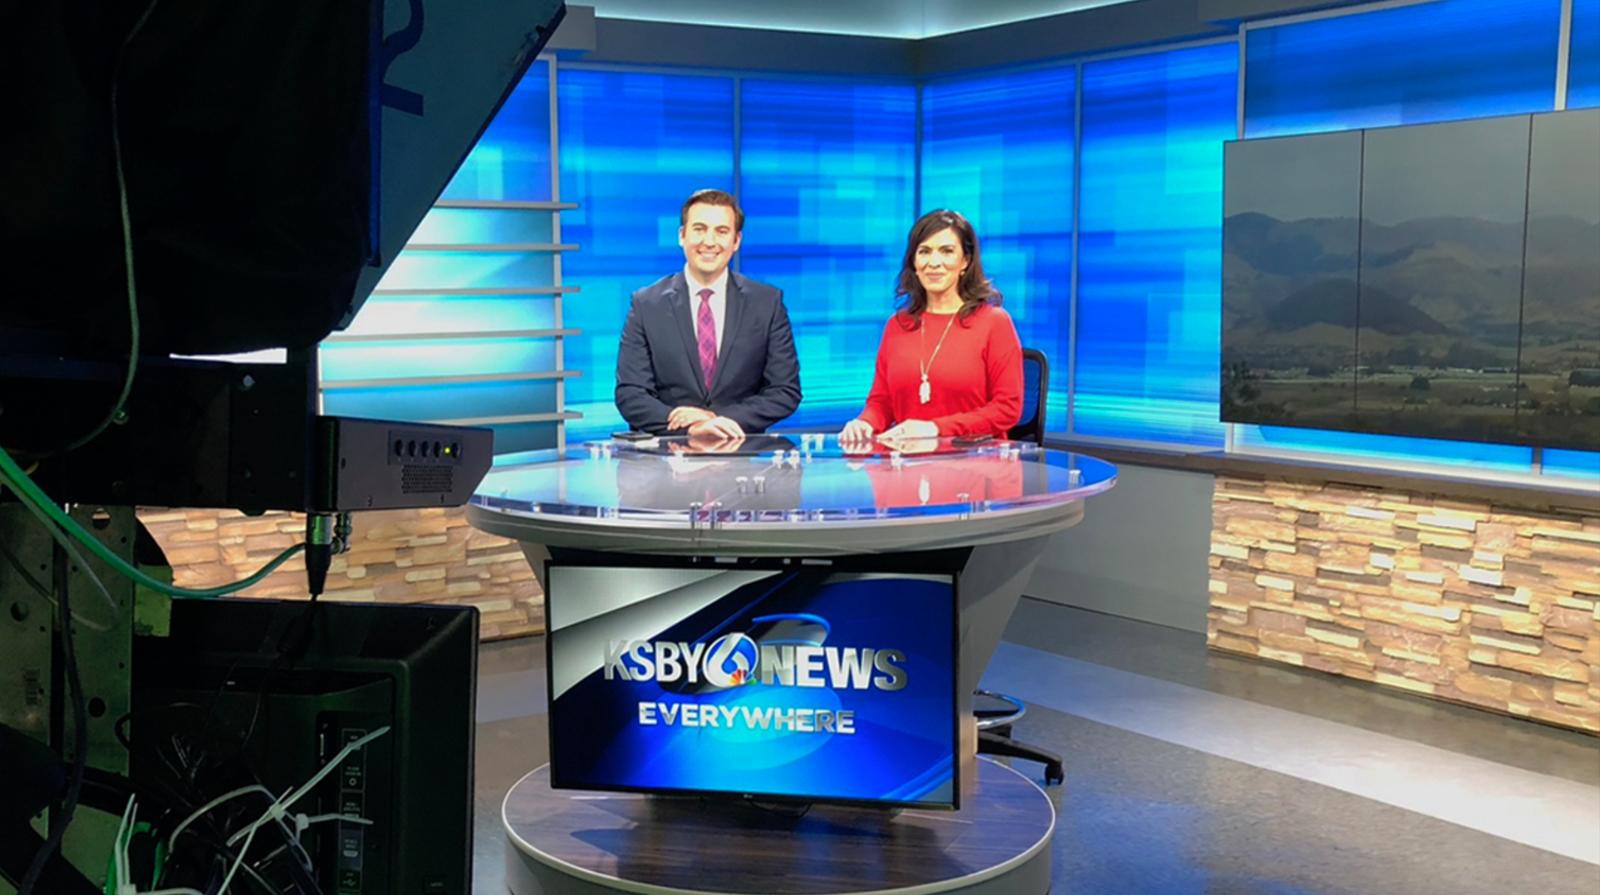 ncs_ksby-6-news-tv-studio-devlin_0004